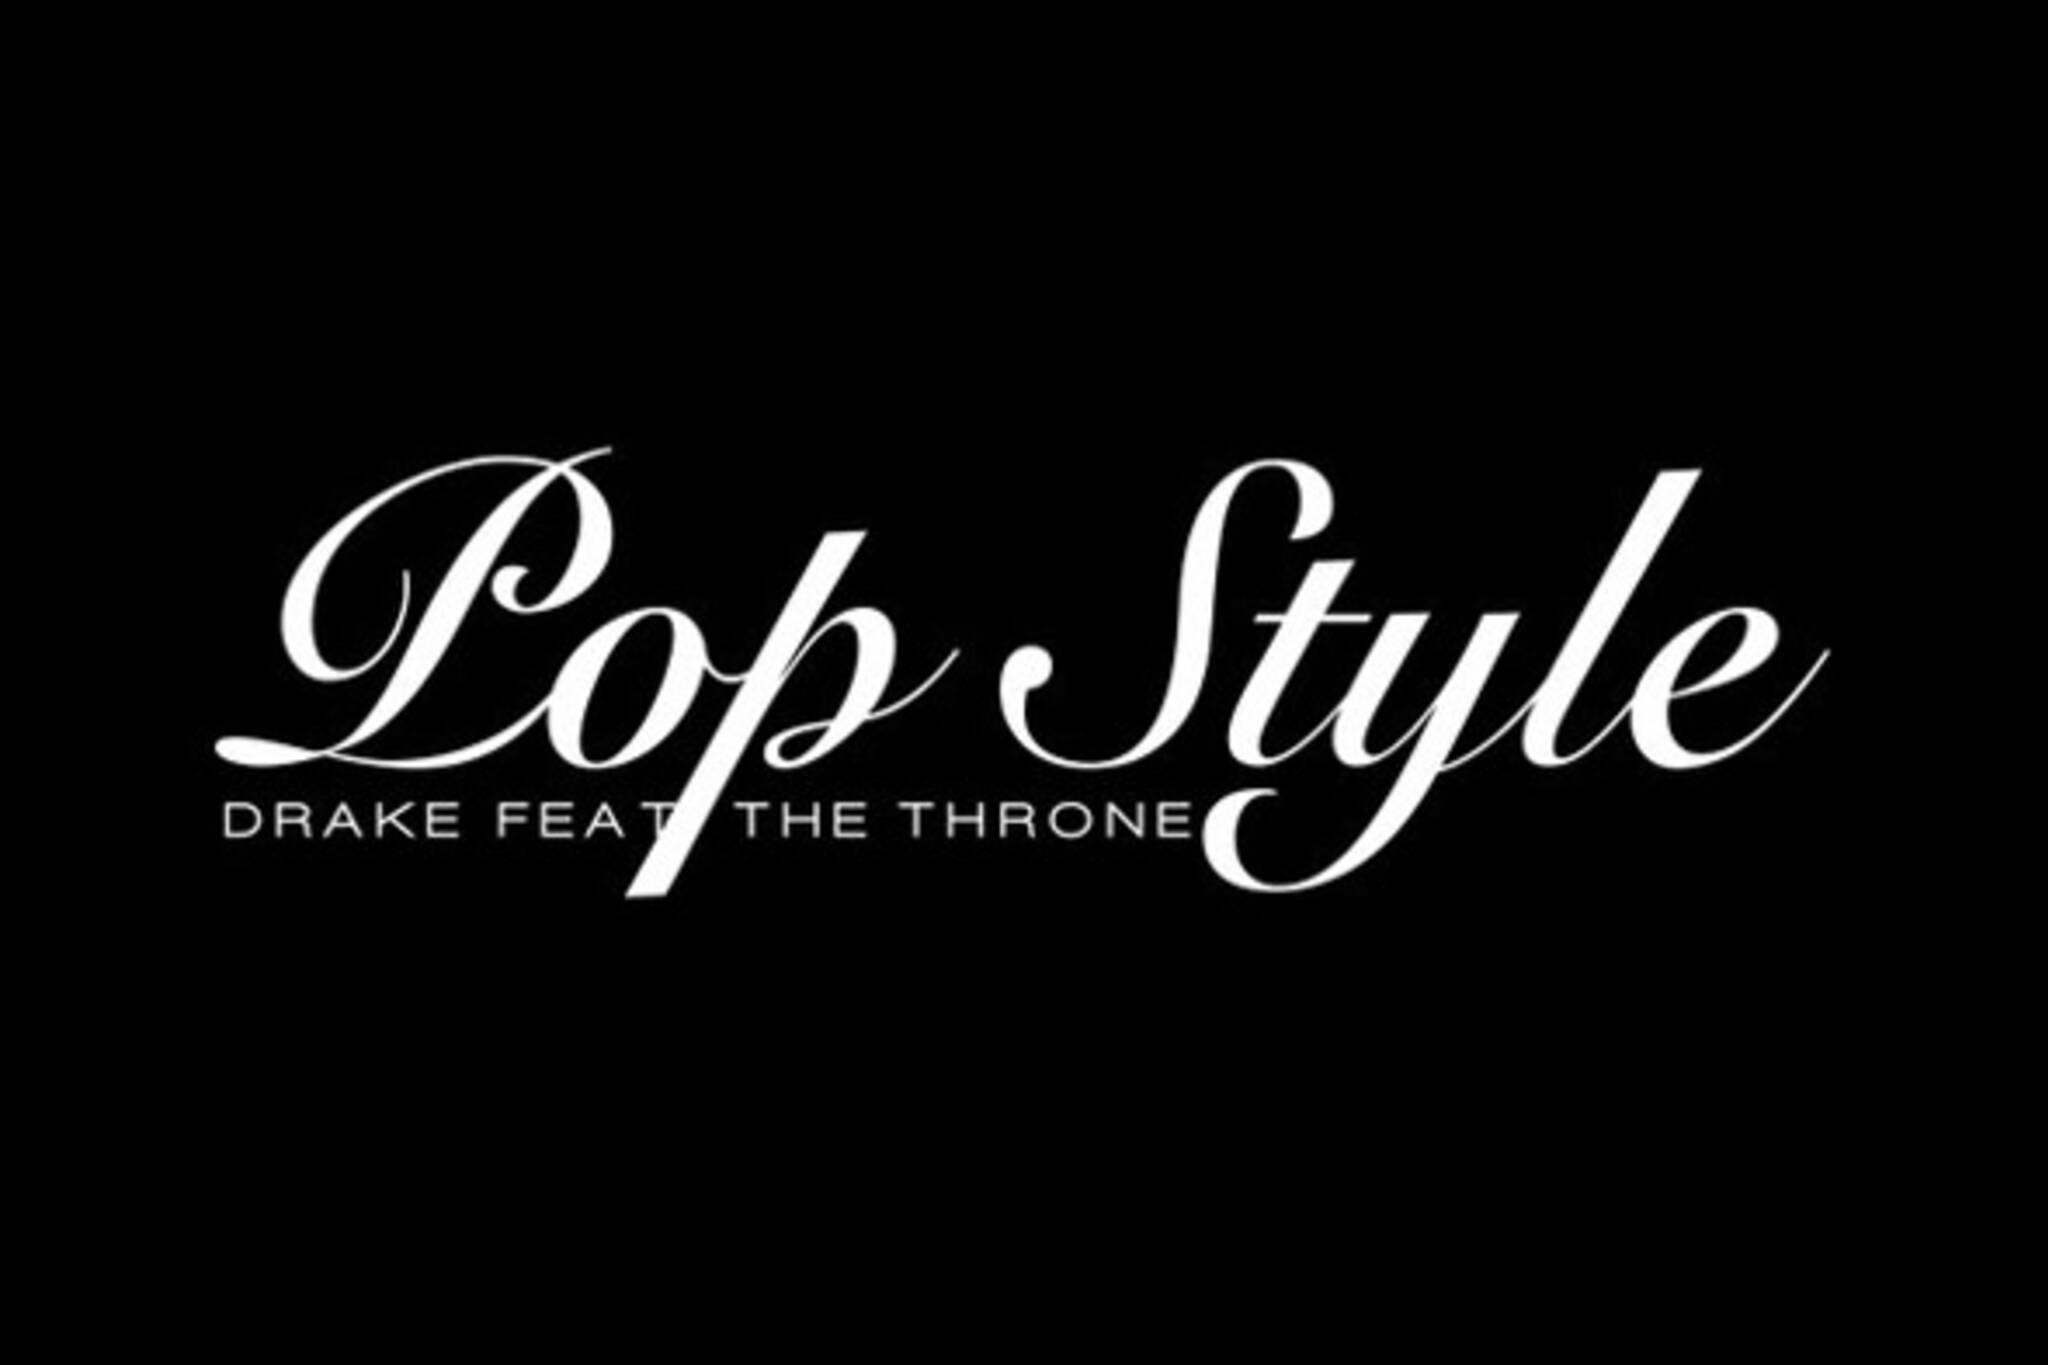 drake pop style